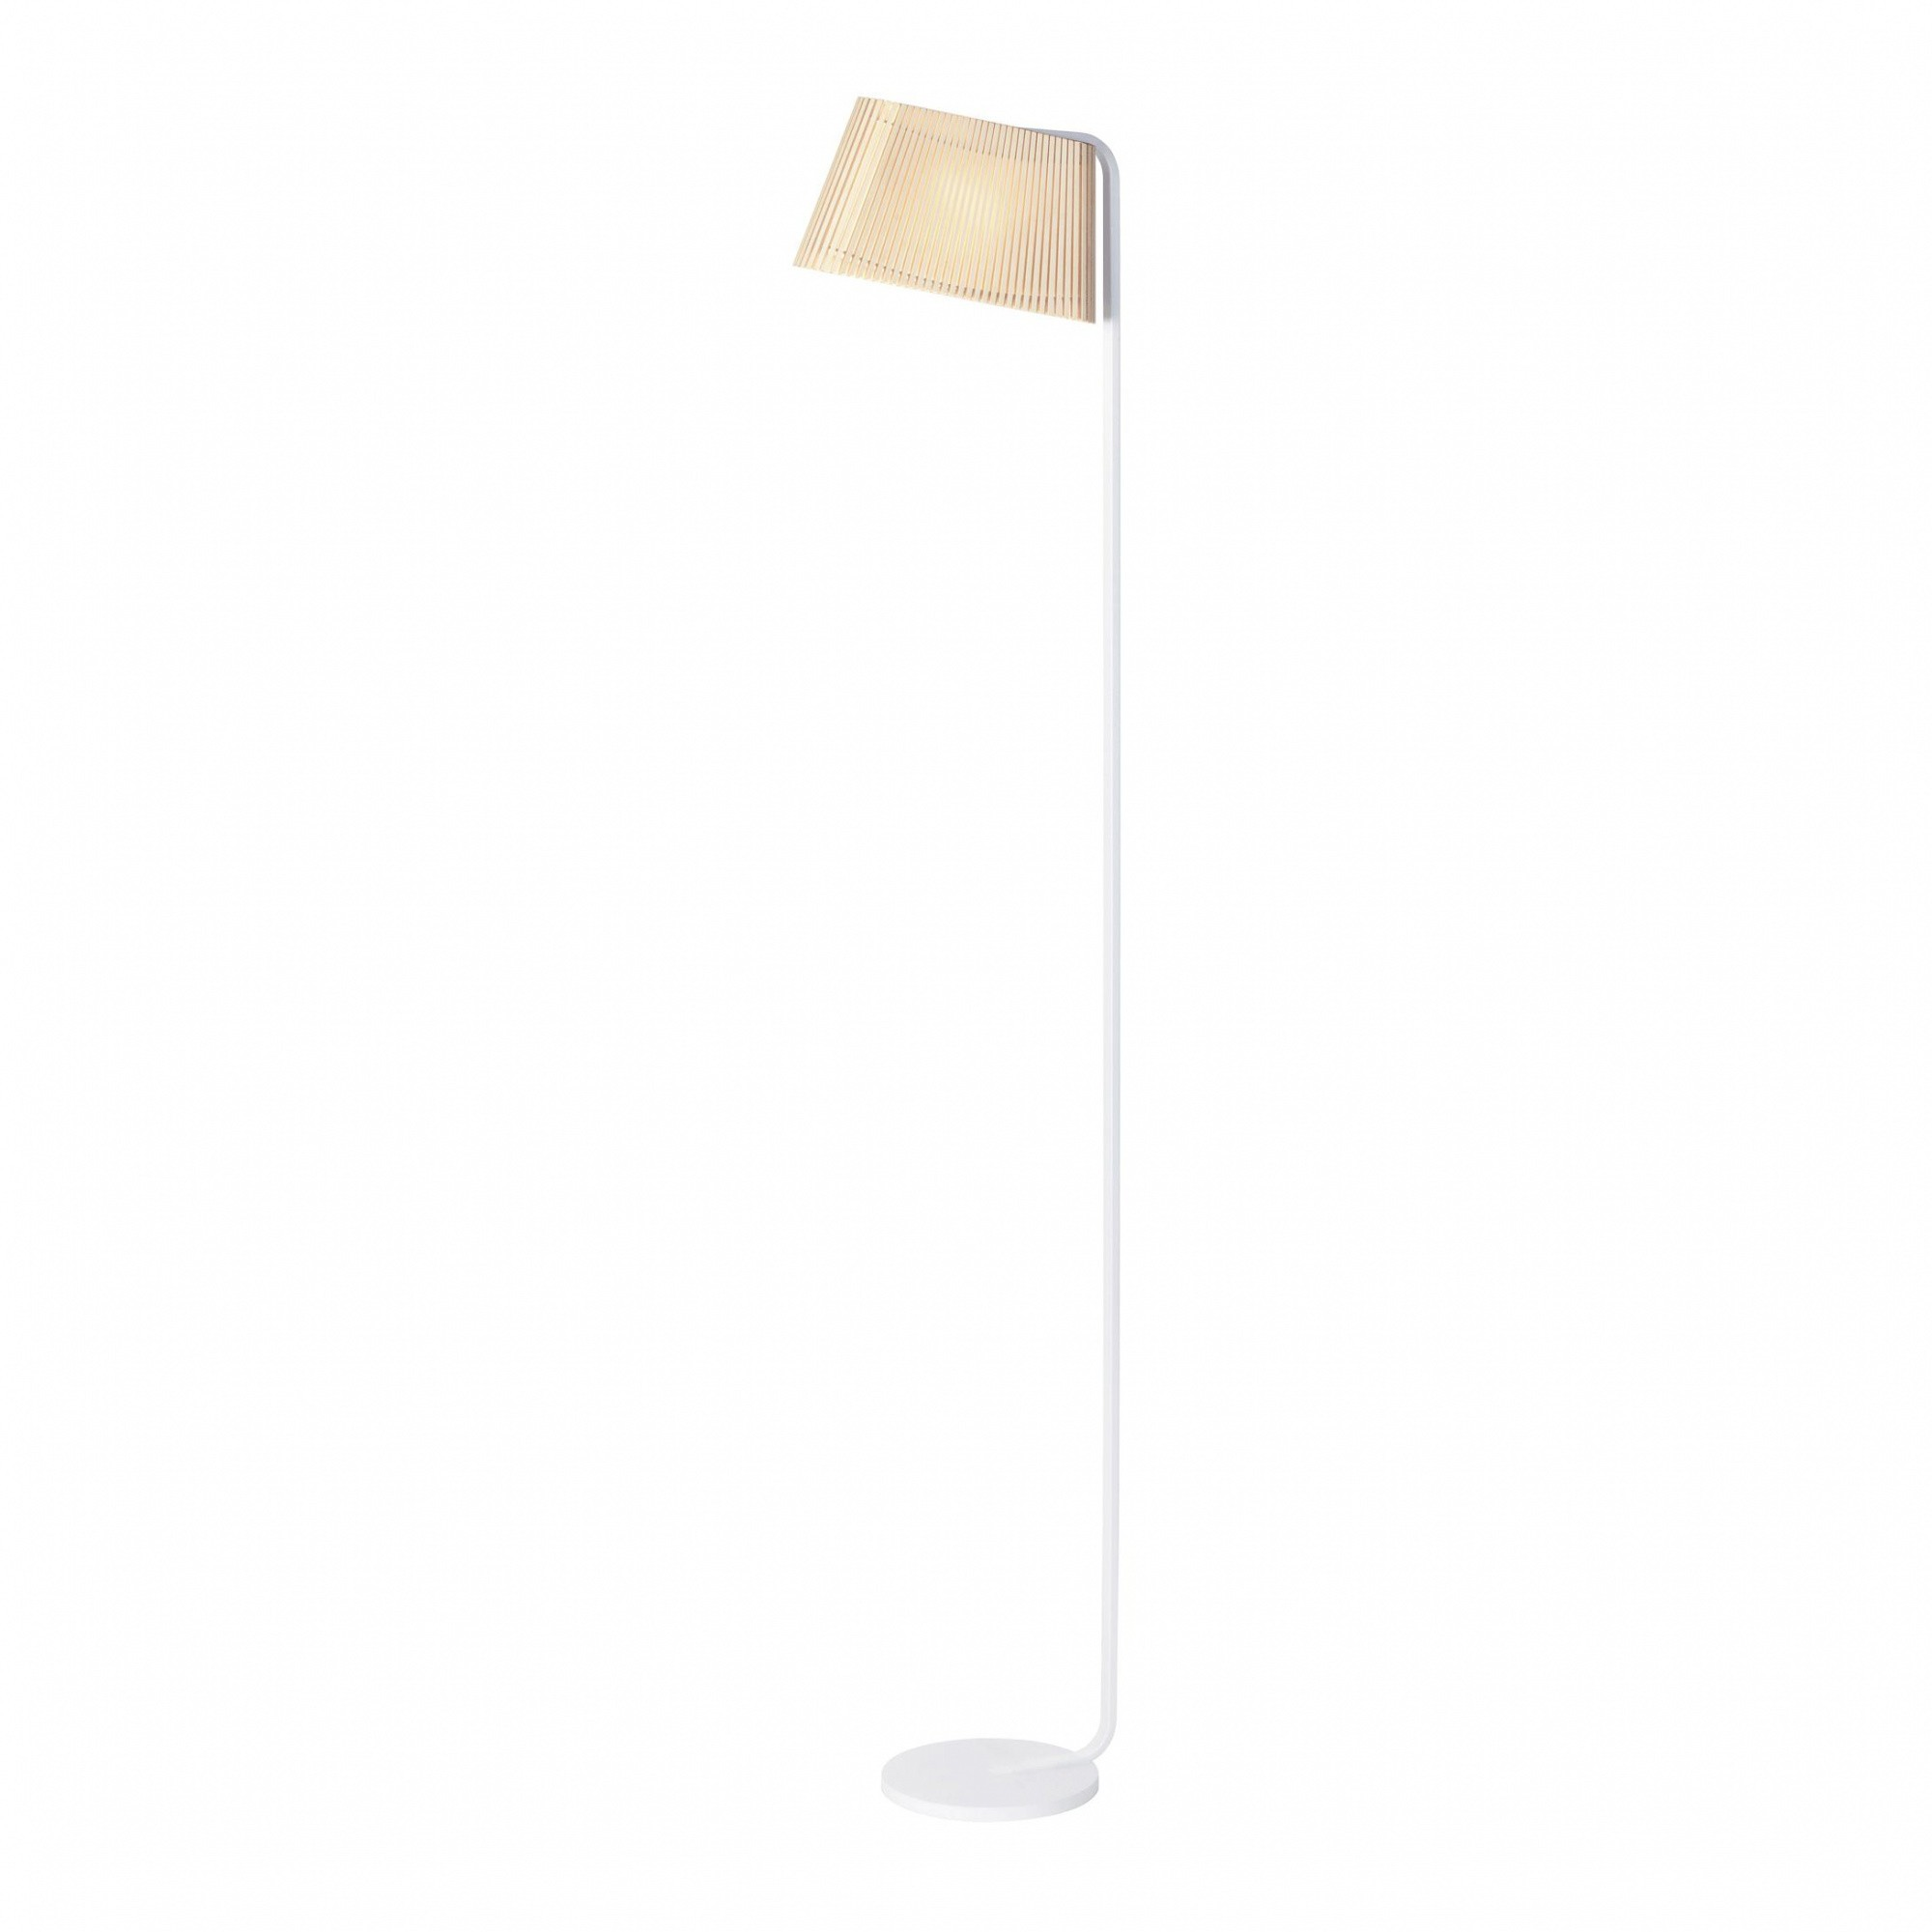 Secto Design Owalo 7010 Lampadaire Led Ambientedirect